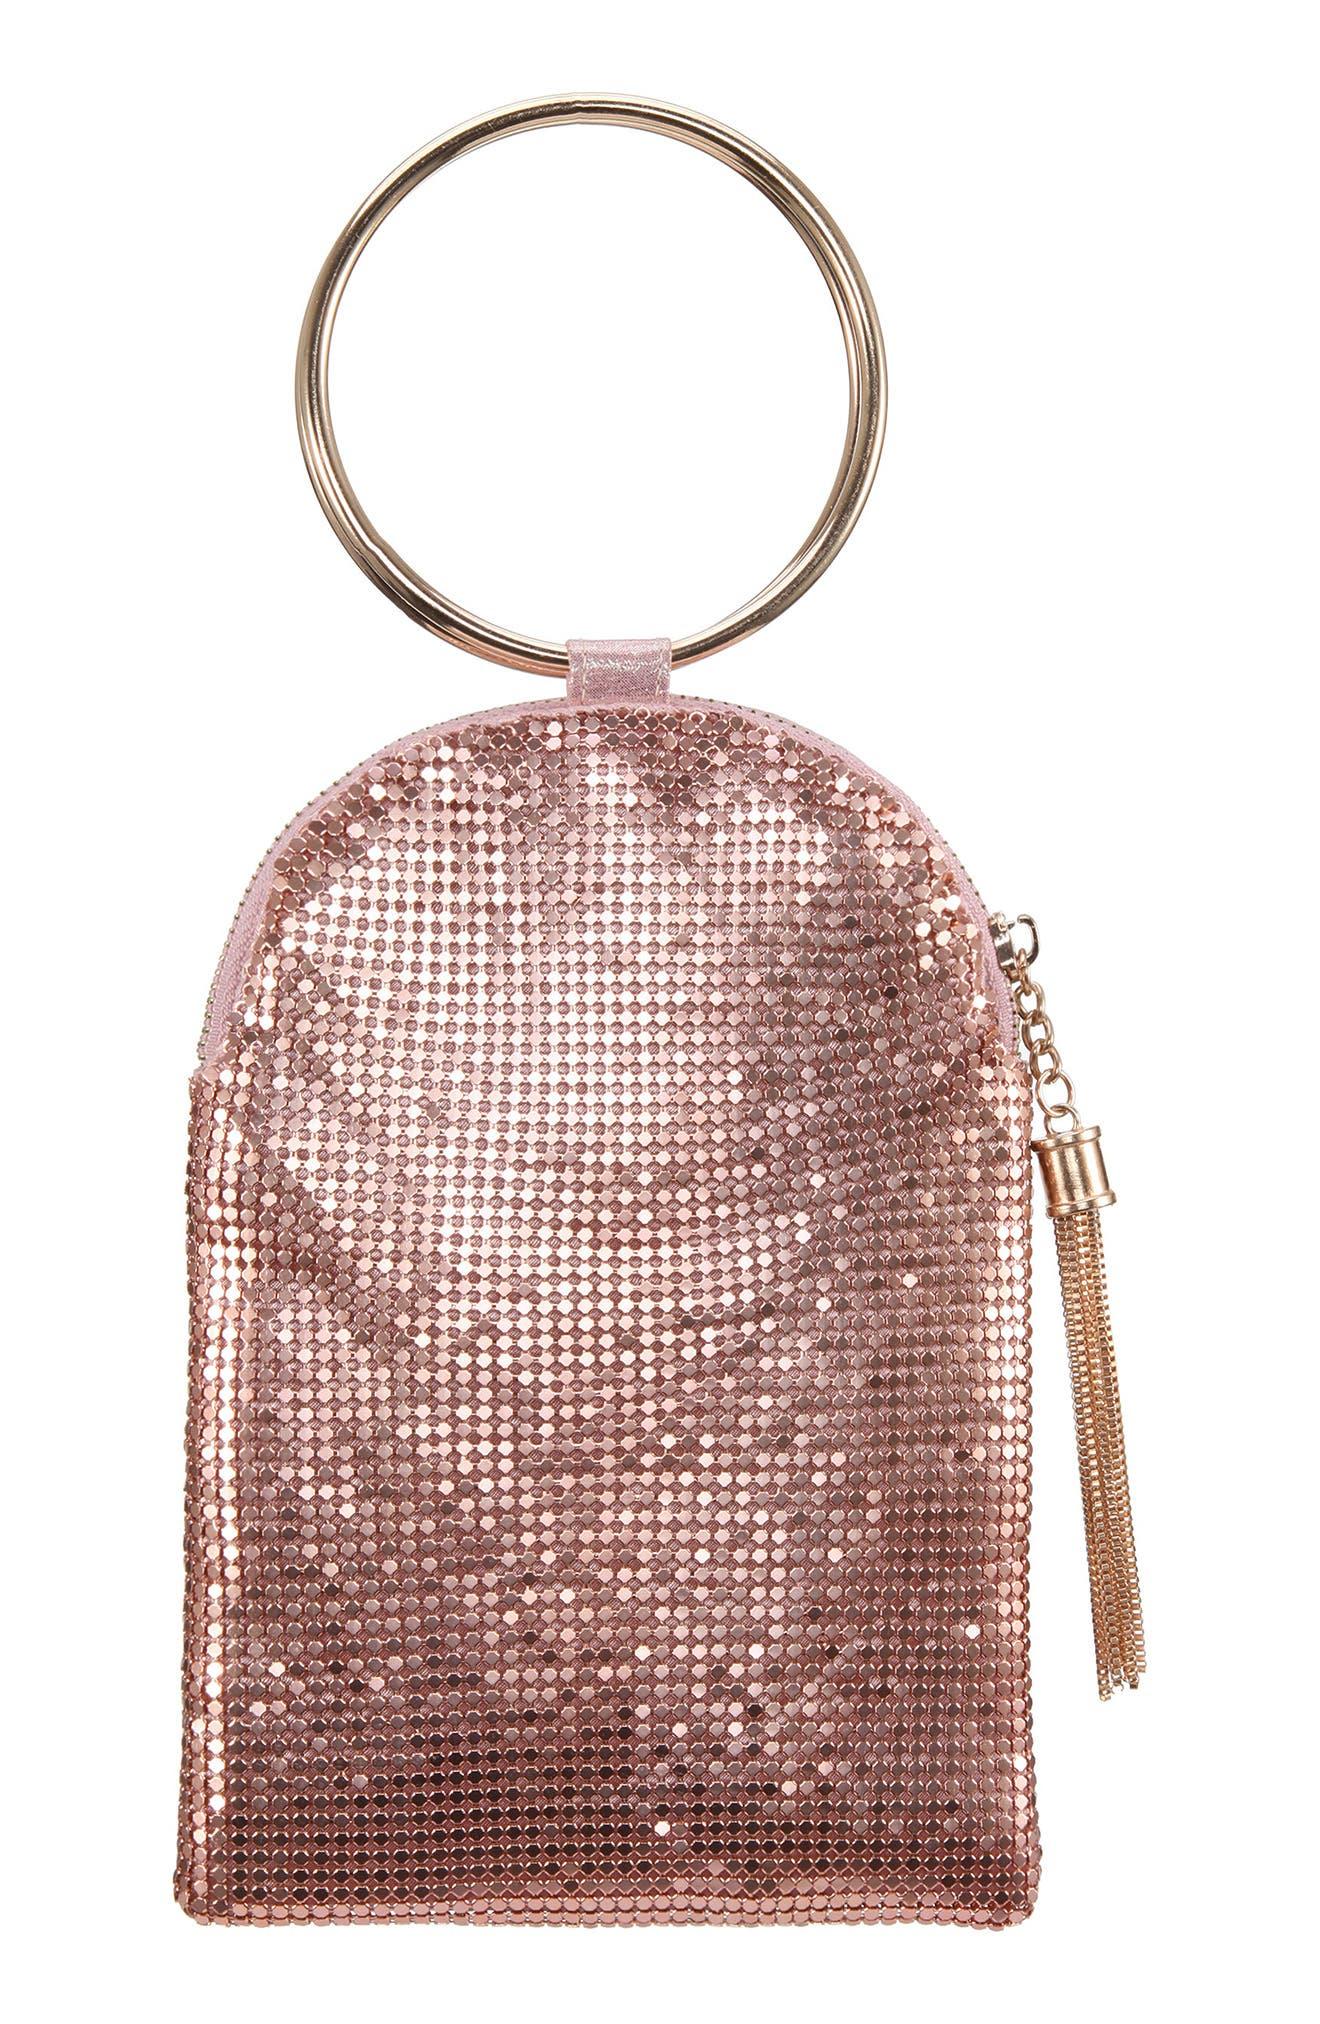 Vintage Handbags, Purses, Bags *New* Nina Metallic Mesh Handbag - Pink $58.00 AT vintagedancer.com